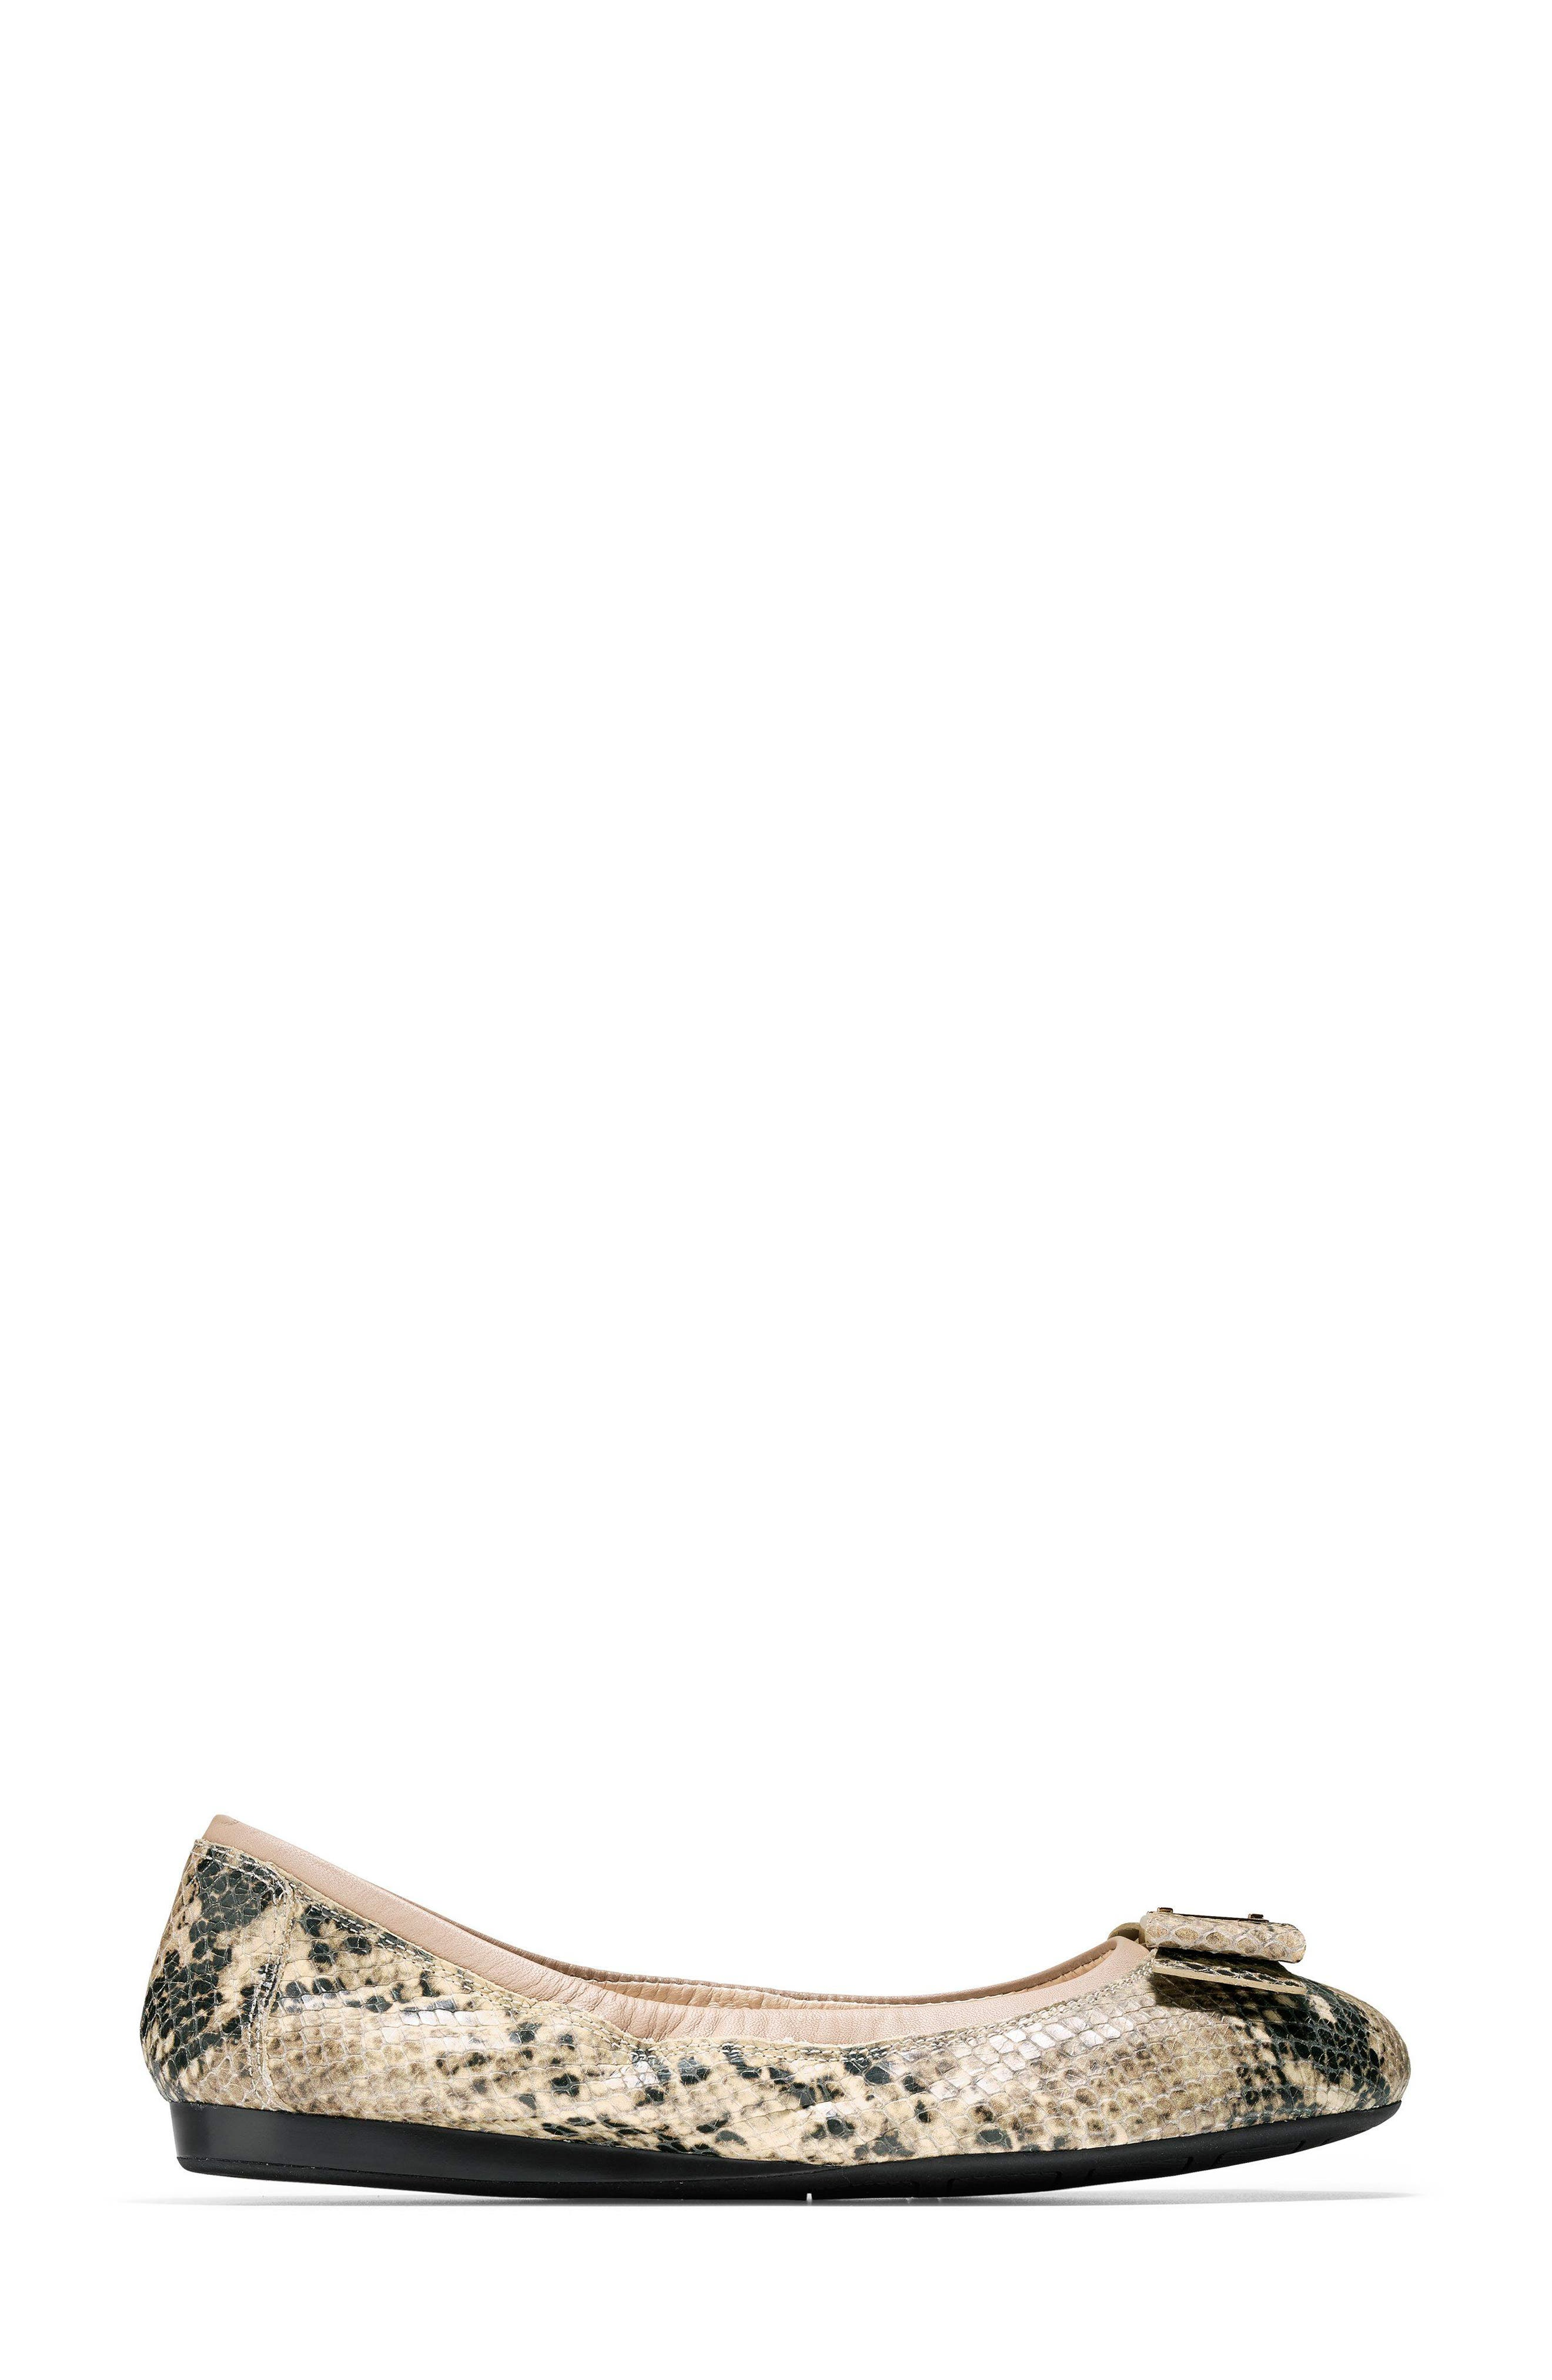 'Tali' Bow Ballet Flat,                             Alternate thumbnail 7, color,                             Roccia Snake Print Leather